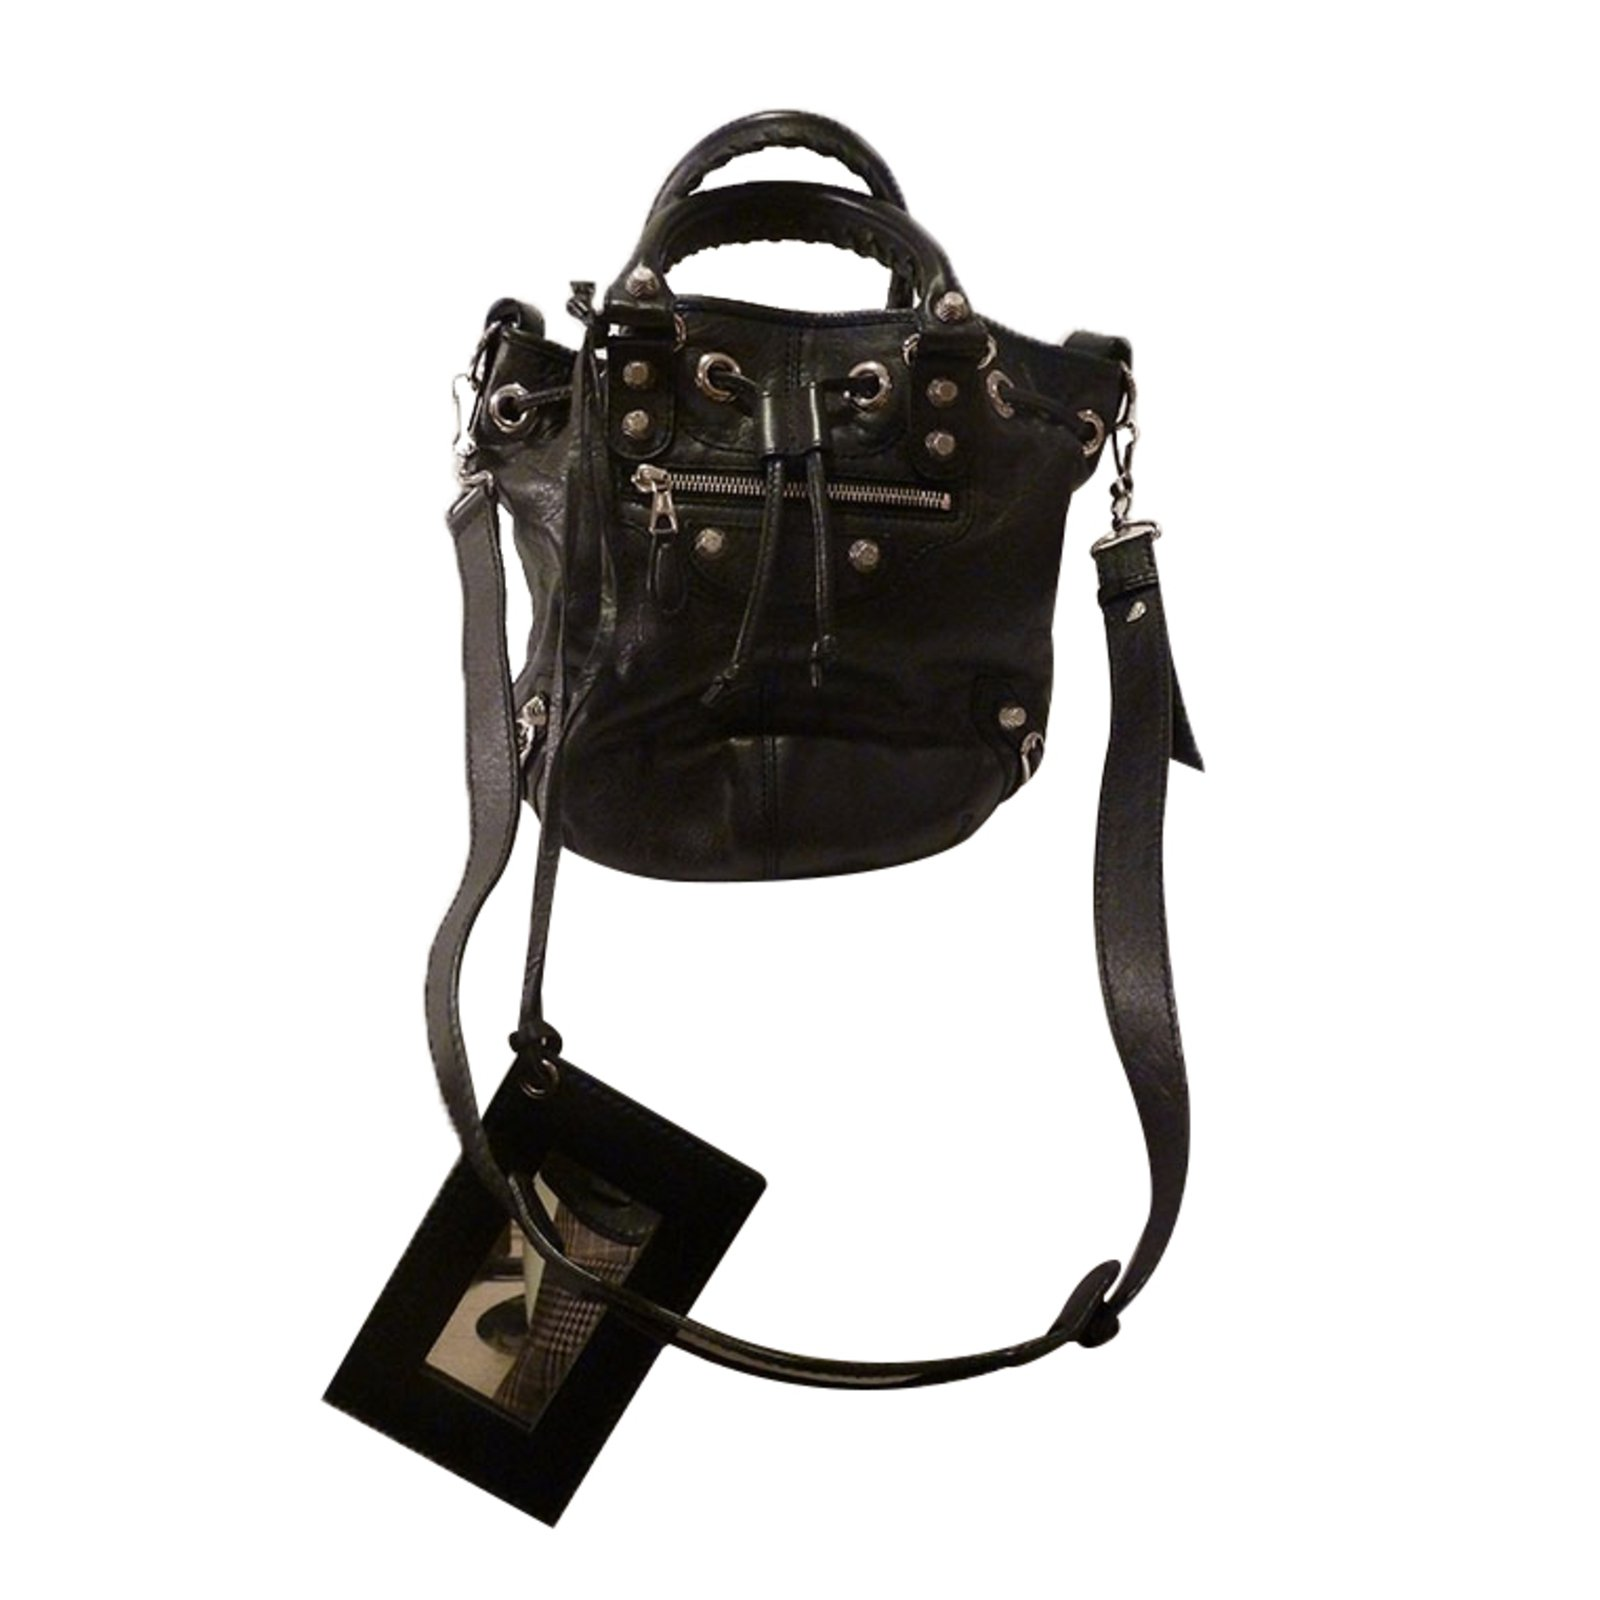 Balenciaga Giant 12 Mini Pom Pom Bucket Bag Handbags Leather Black  ref.27067 - Joli Closet 798ad8cf4e6e5